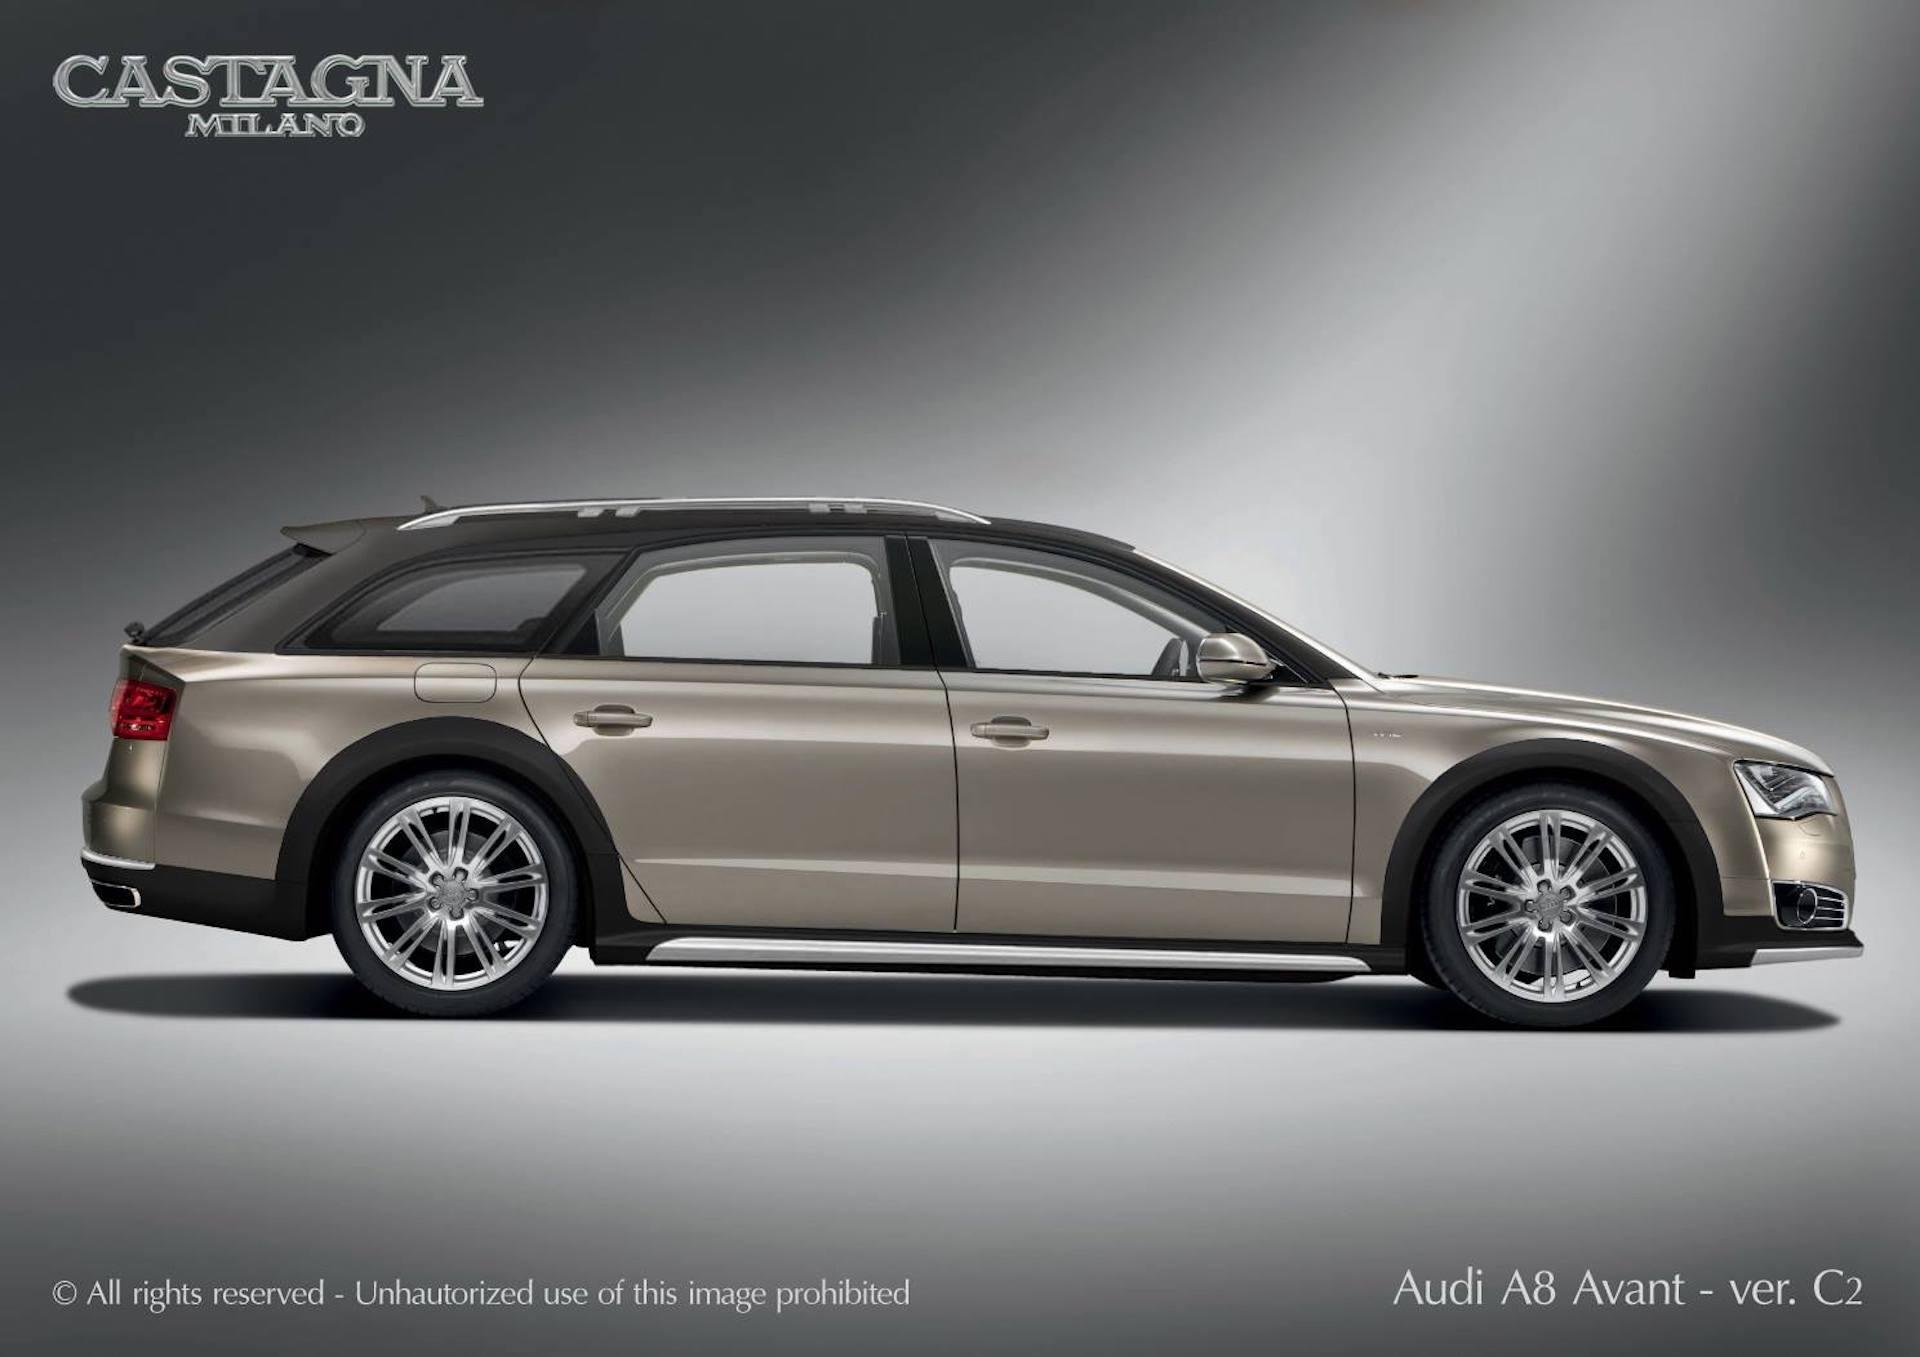 Italian coachbuilder plans Audi A8 Avant wagon